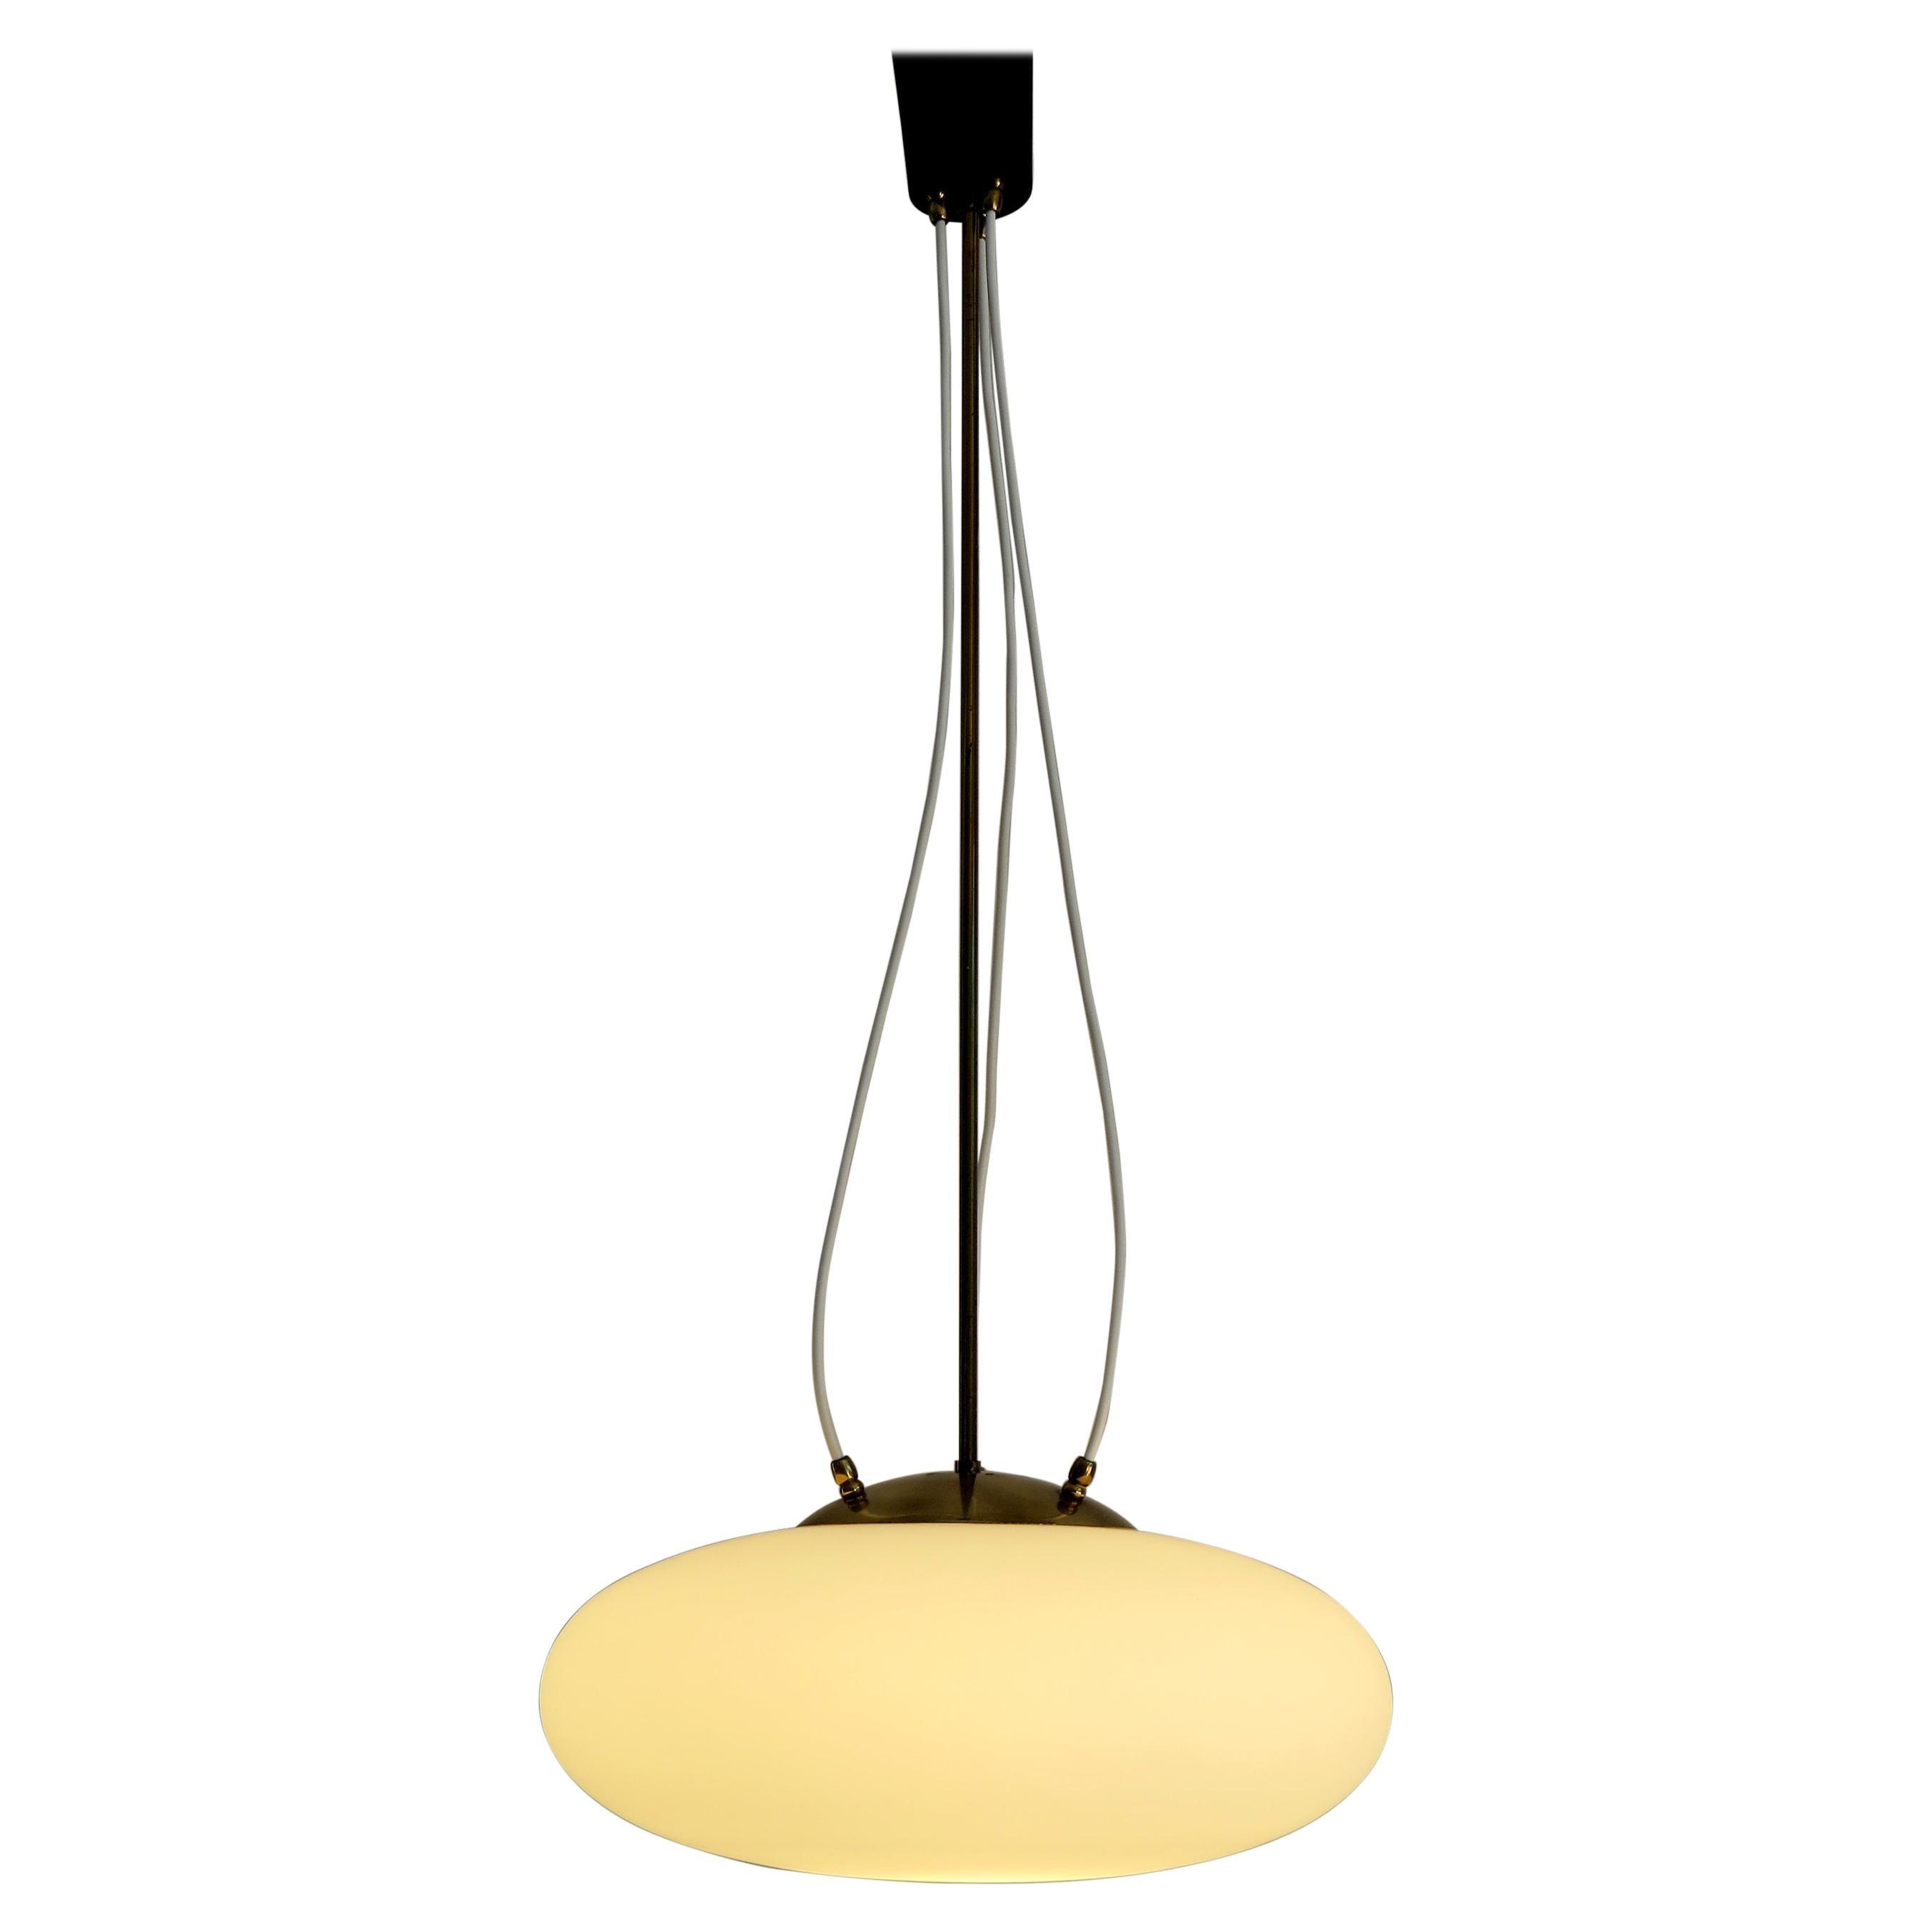 Stilnovo Italian White Glass and Brass Pendant Lamp, 1950s